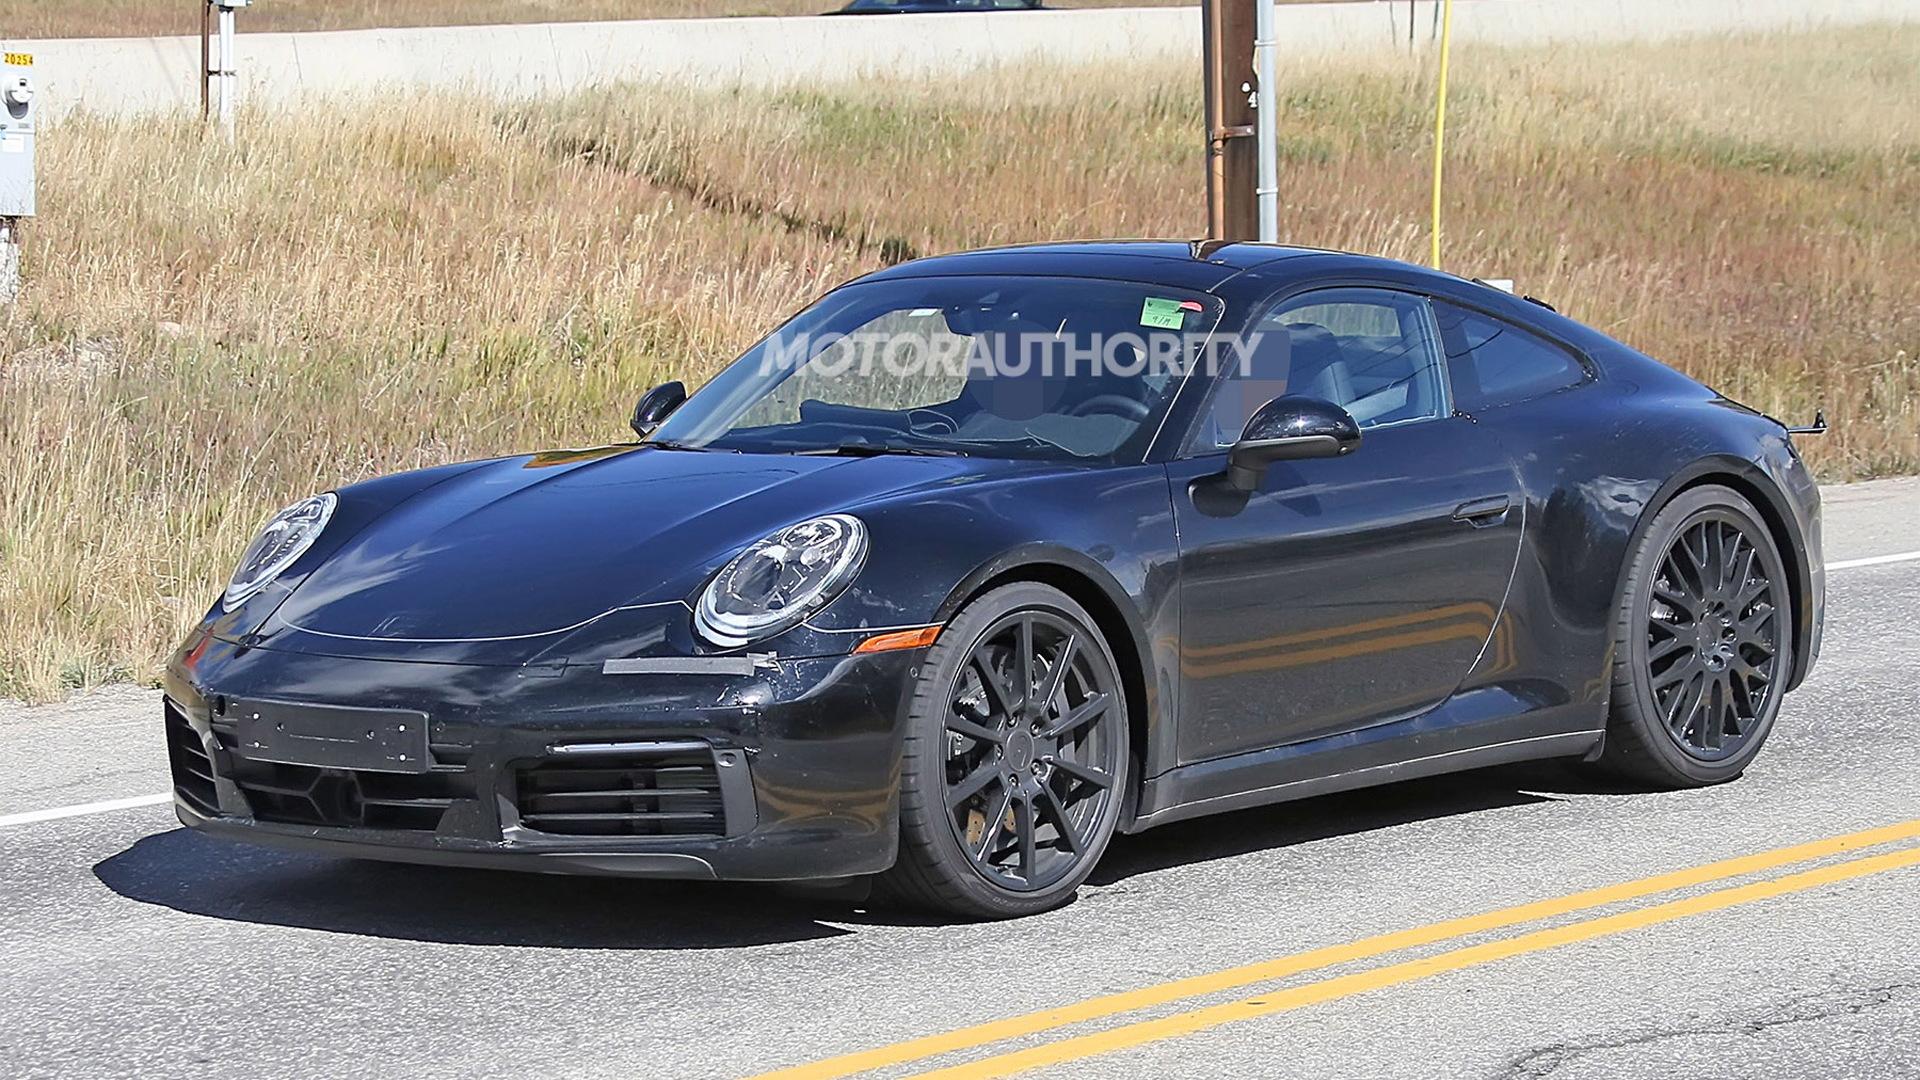 2020 Porsche 911 spy shots - Image via S. Baldauf/SB-Medien